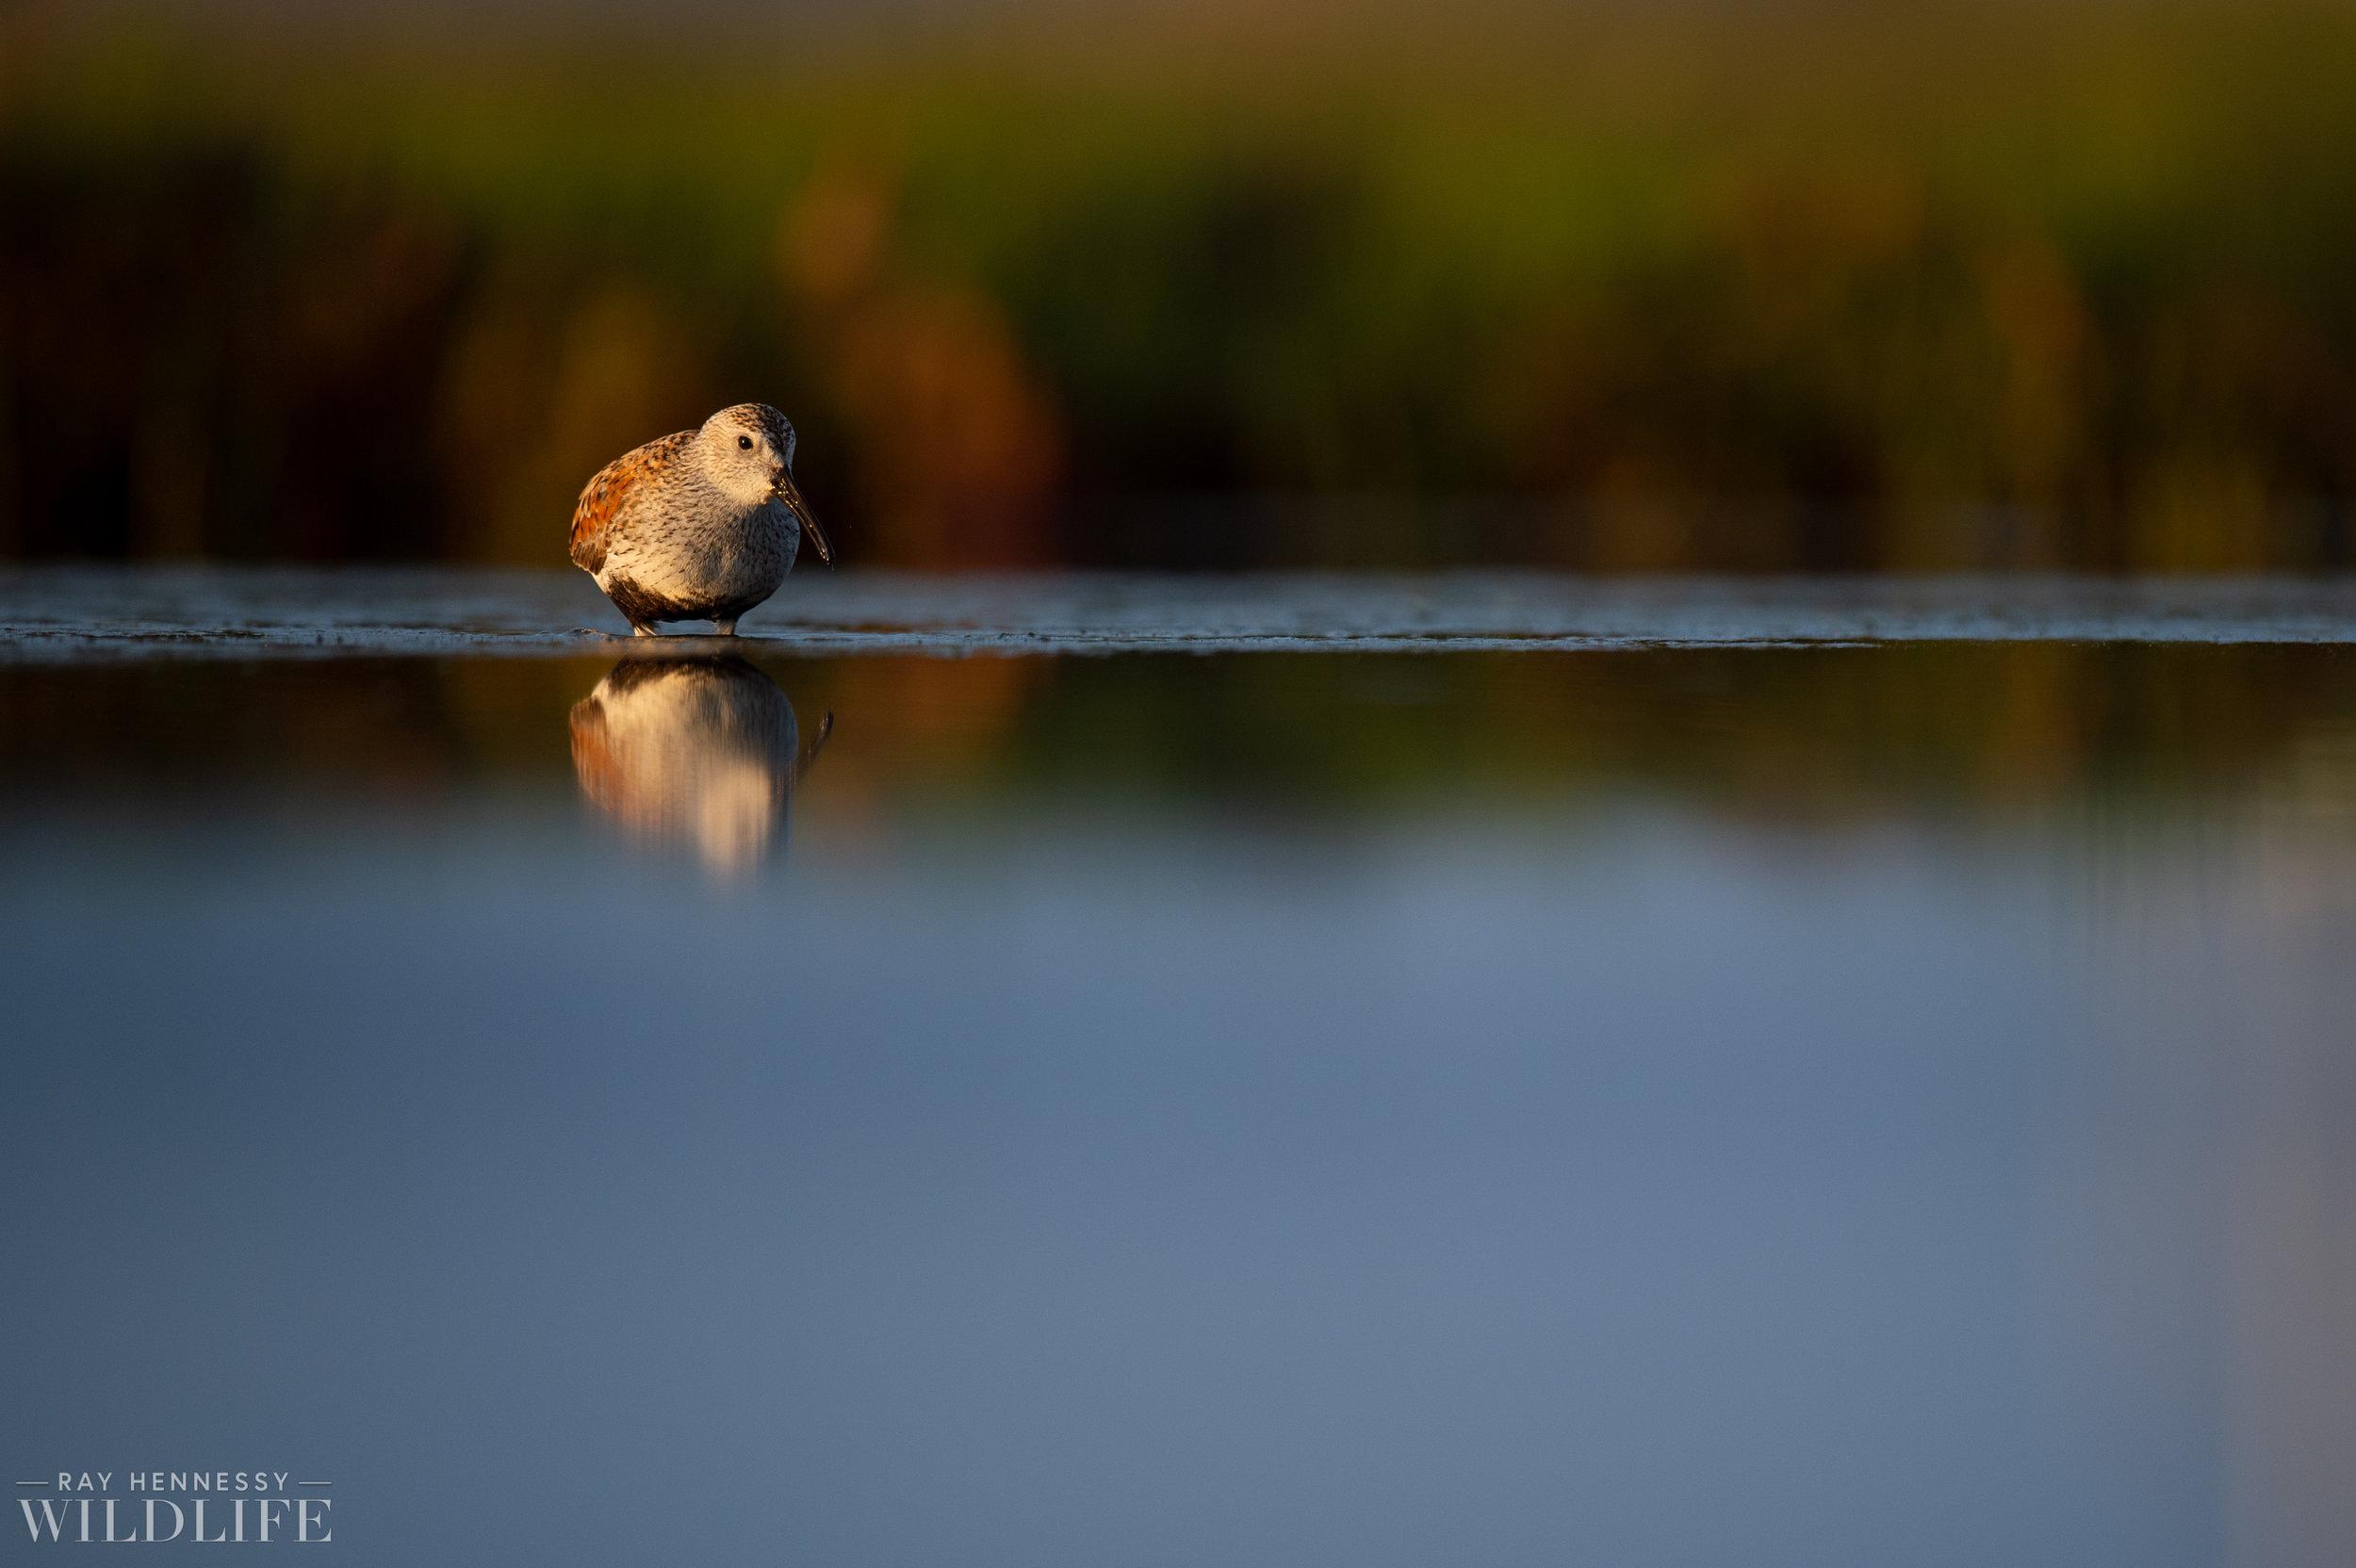 007_shorebirds-prothonotary-warbler.jpg